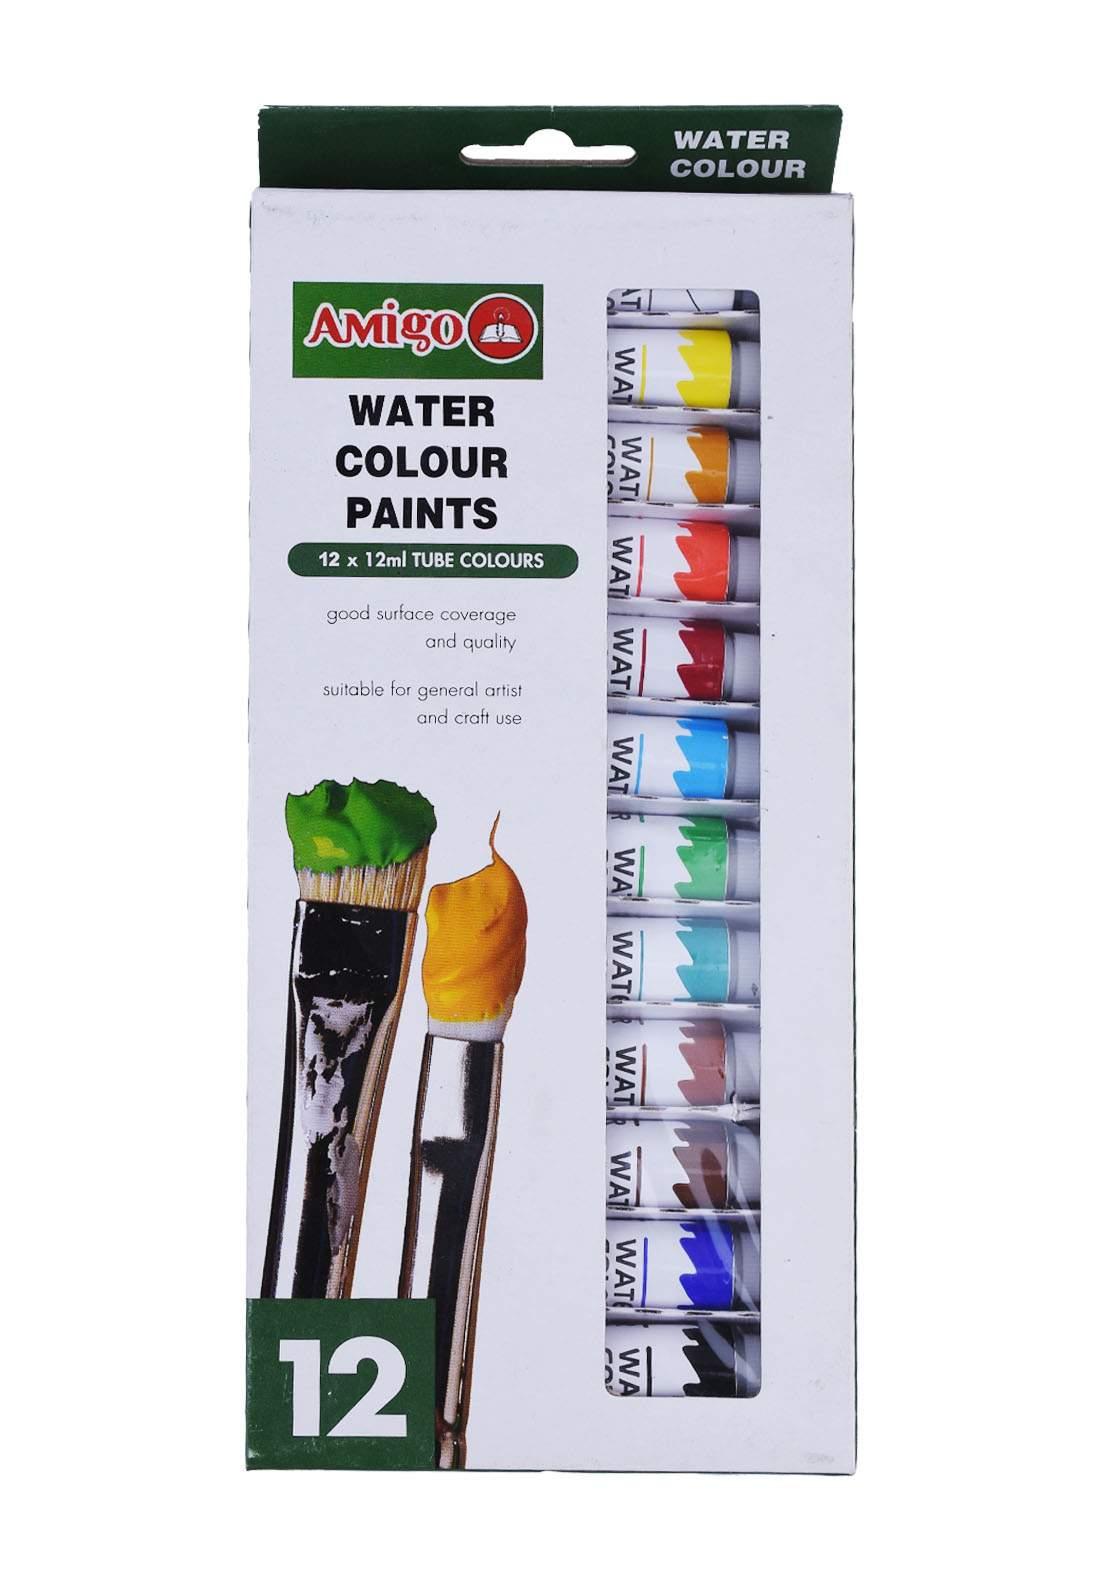 Amigo Watercolour Paint 12 color 12 ml علبة الوان مائية